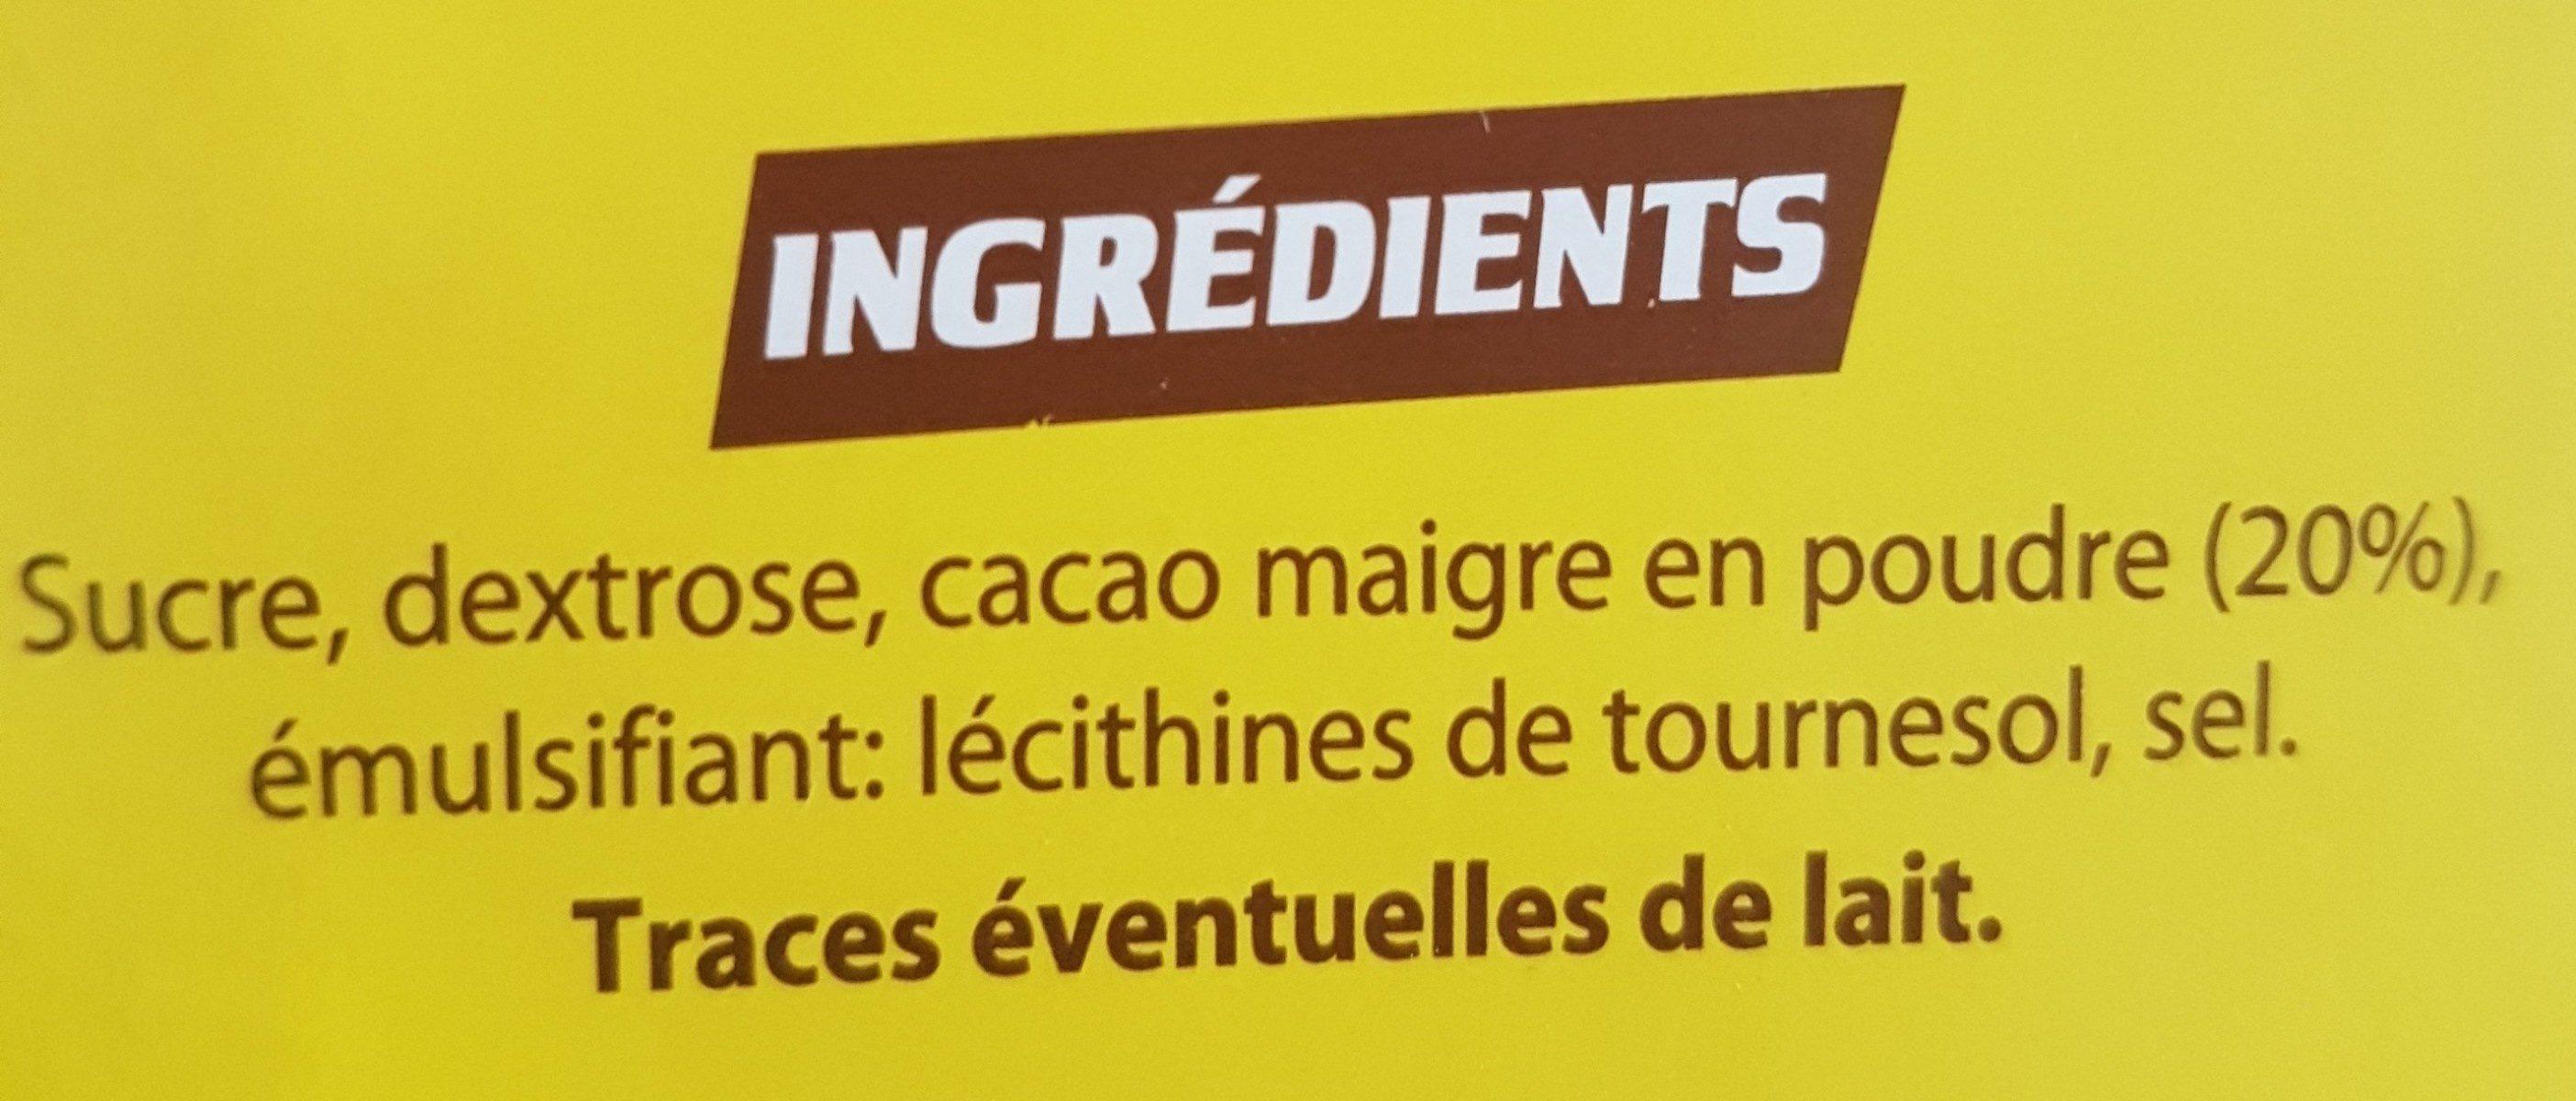 Chocolat en poudre - Ingredients - fr